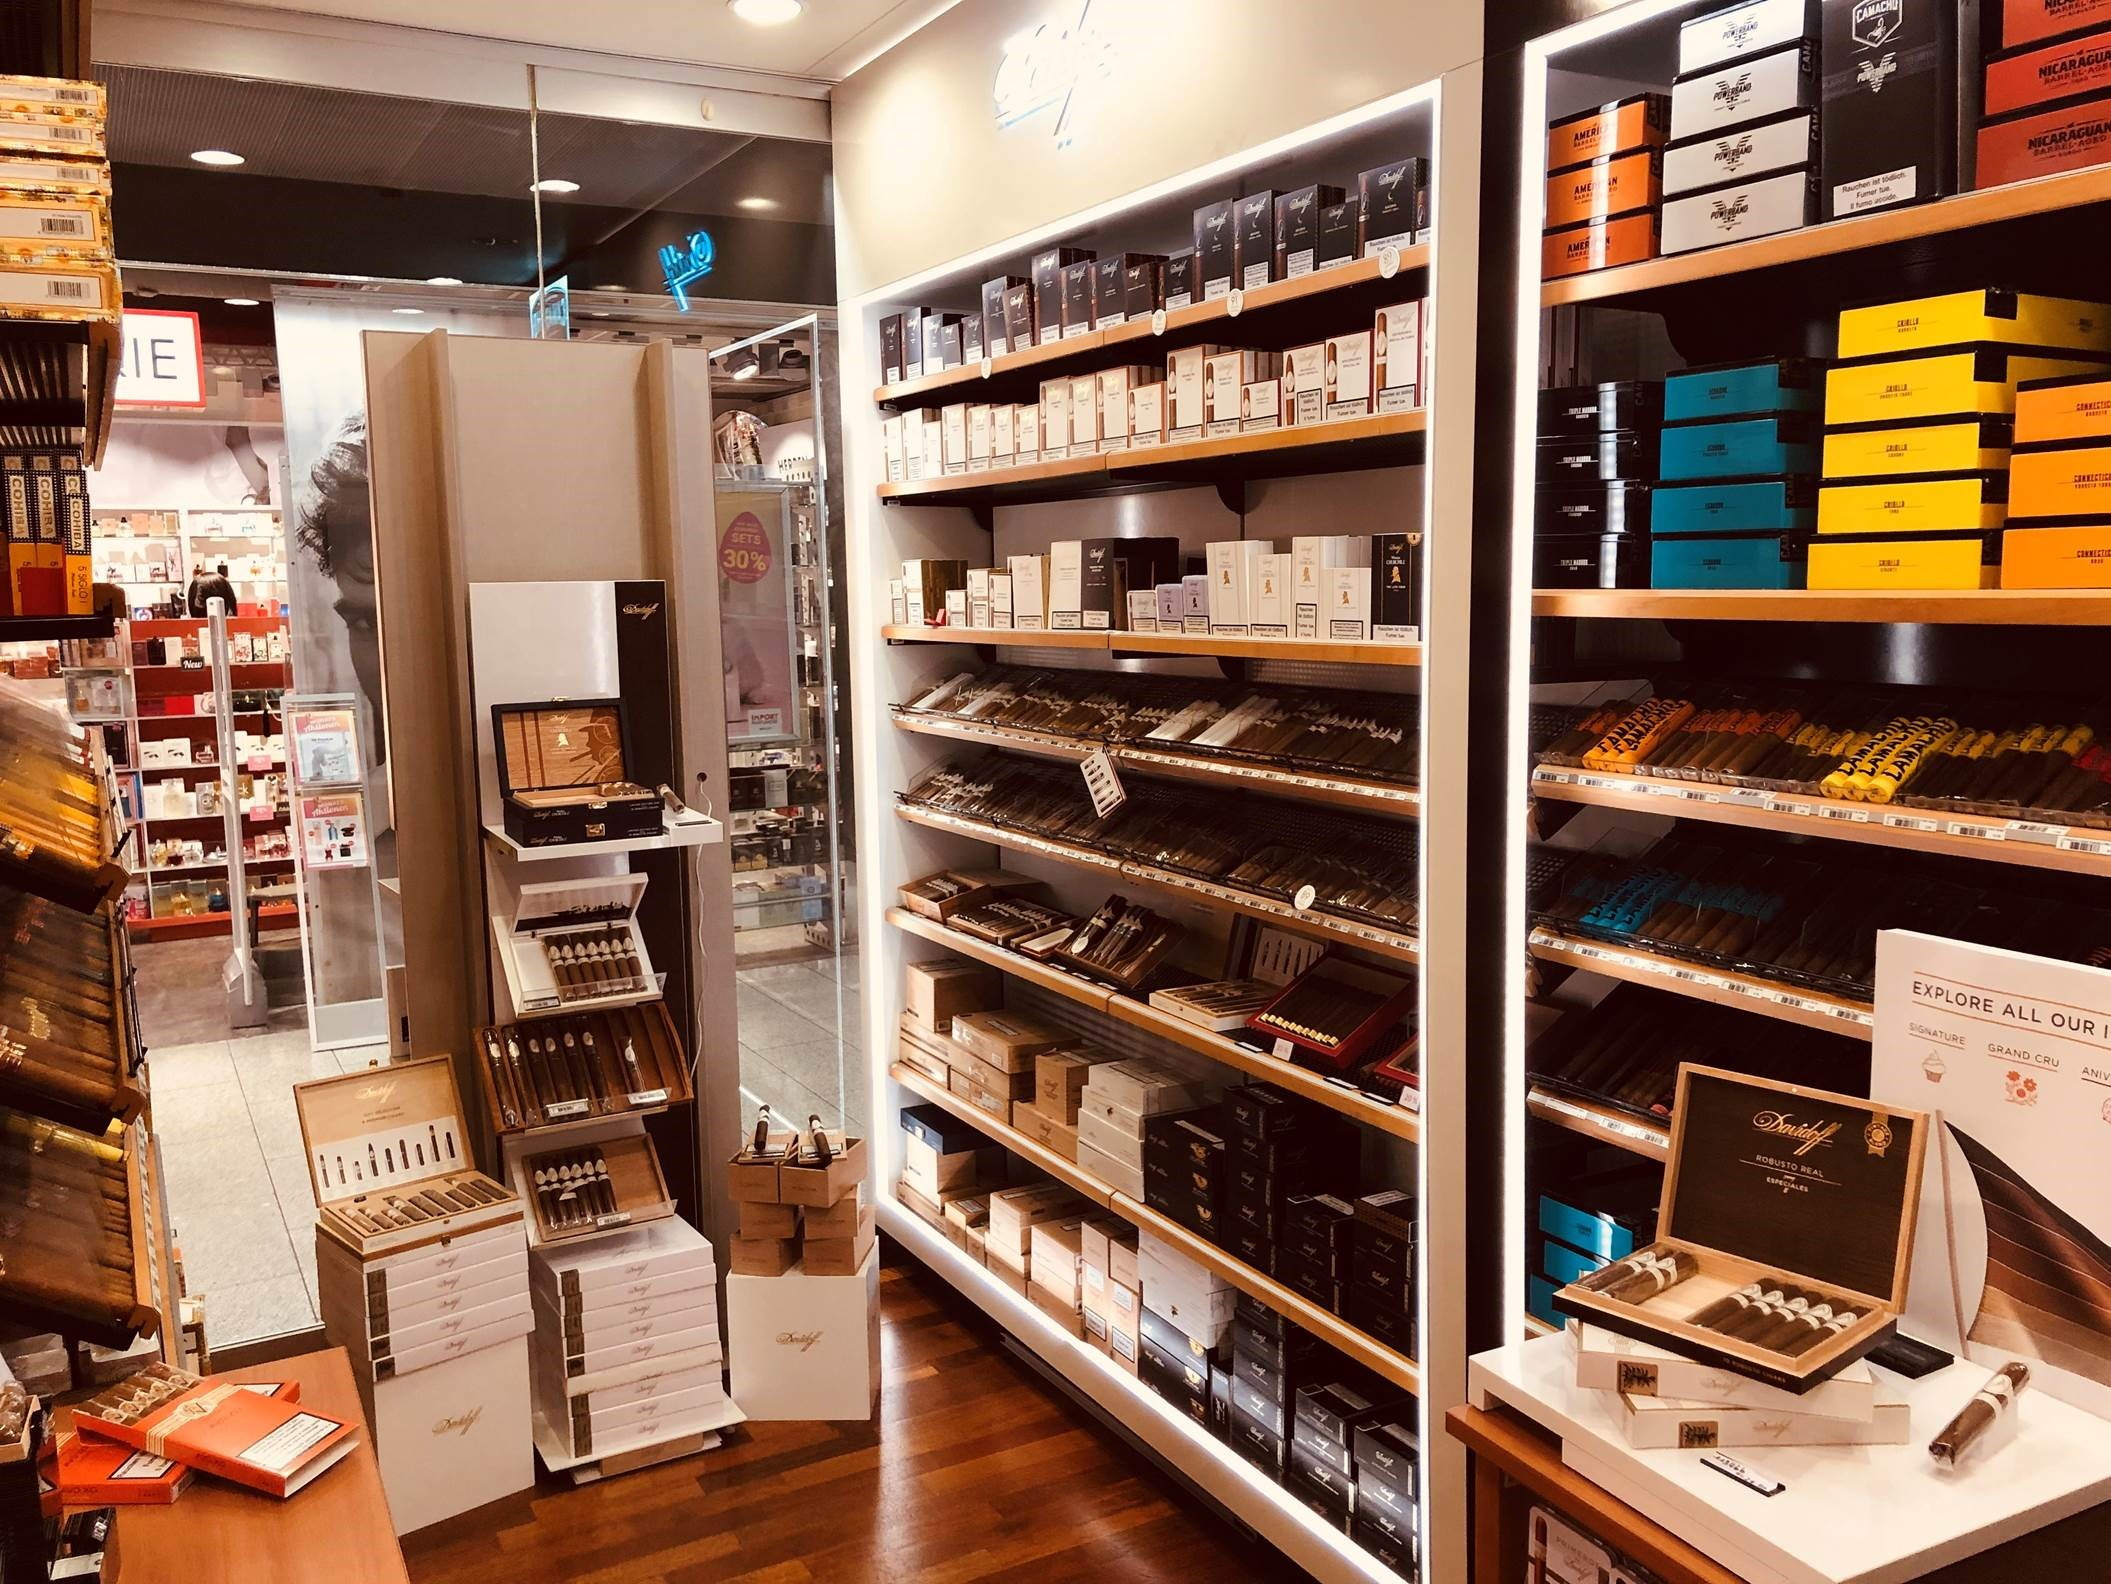 Nägeli zum Tabakfass by Zigarren Dürr